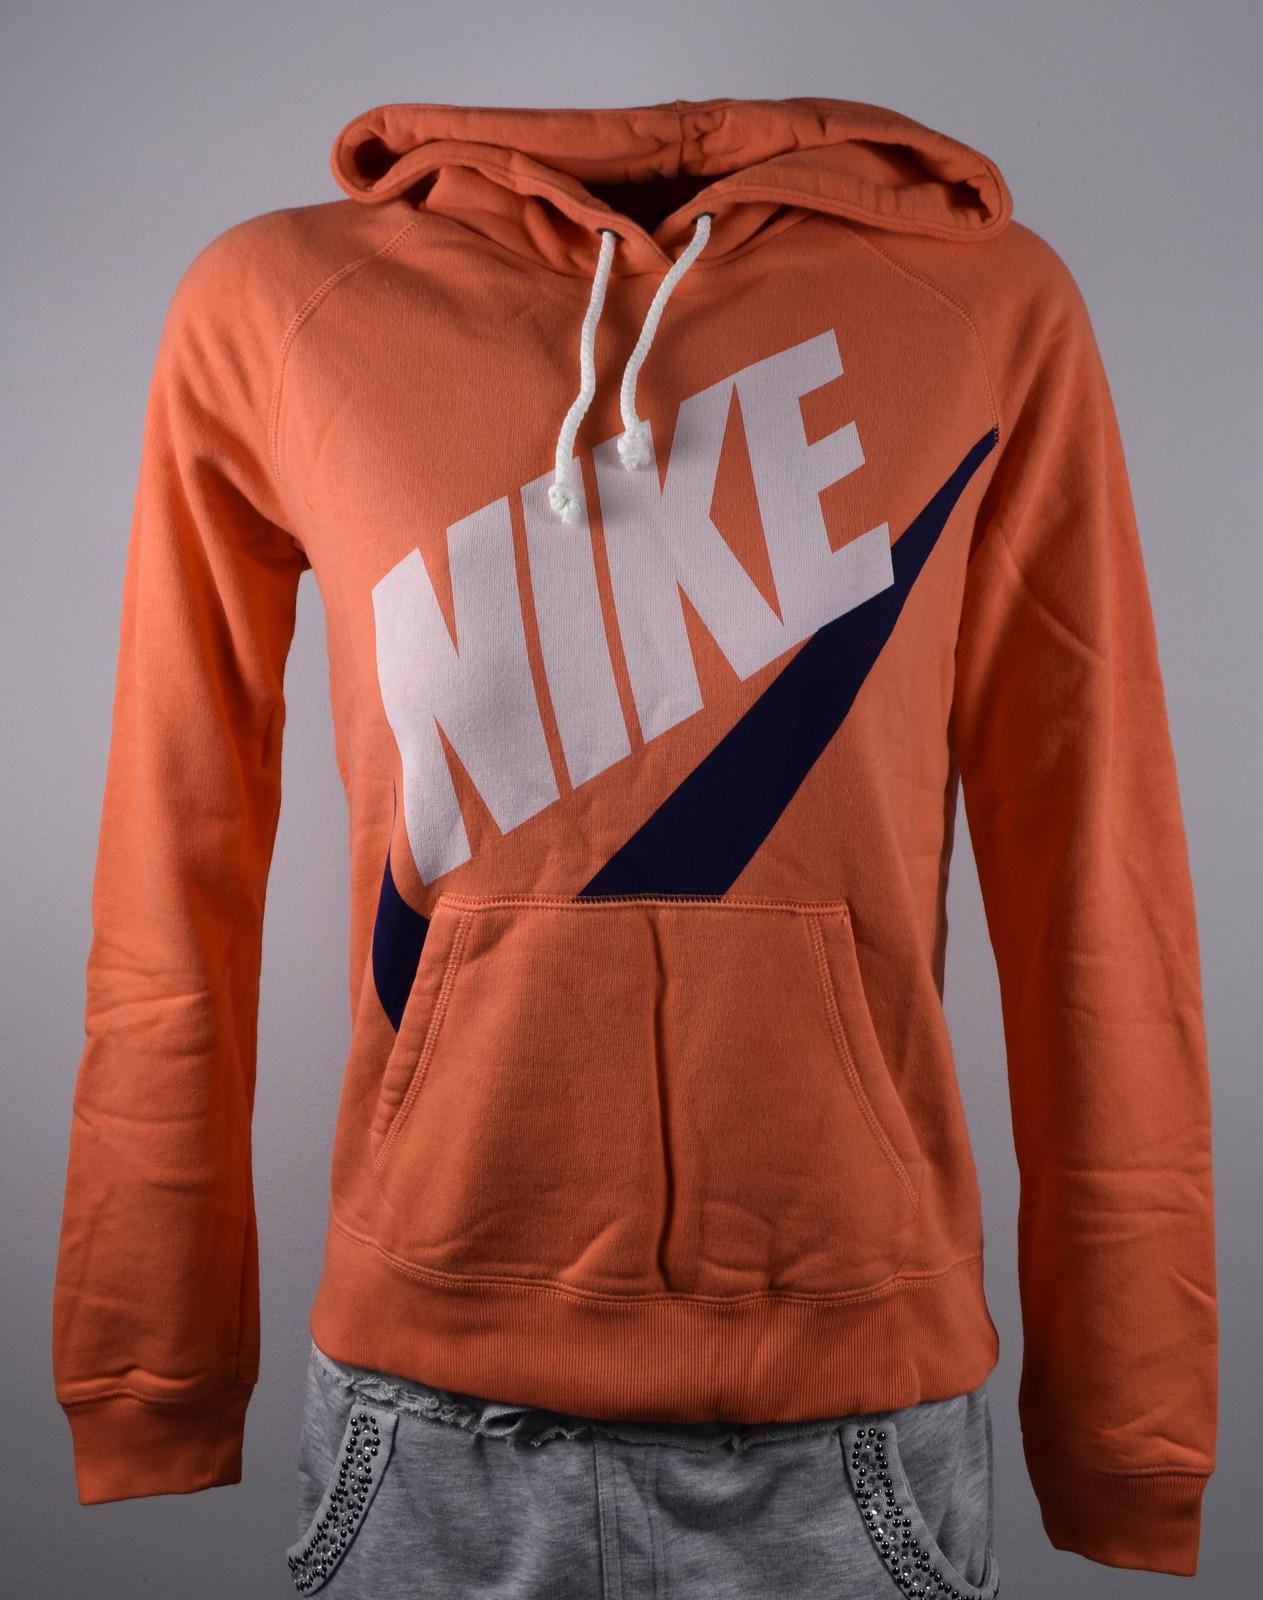 b38d8f58362 Nike Sportswear Advance 15 Cape Dámská mikina US S 545585-801